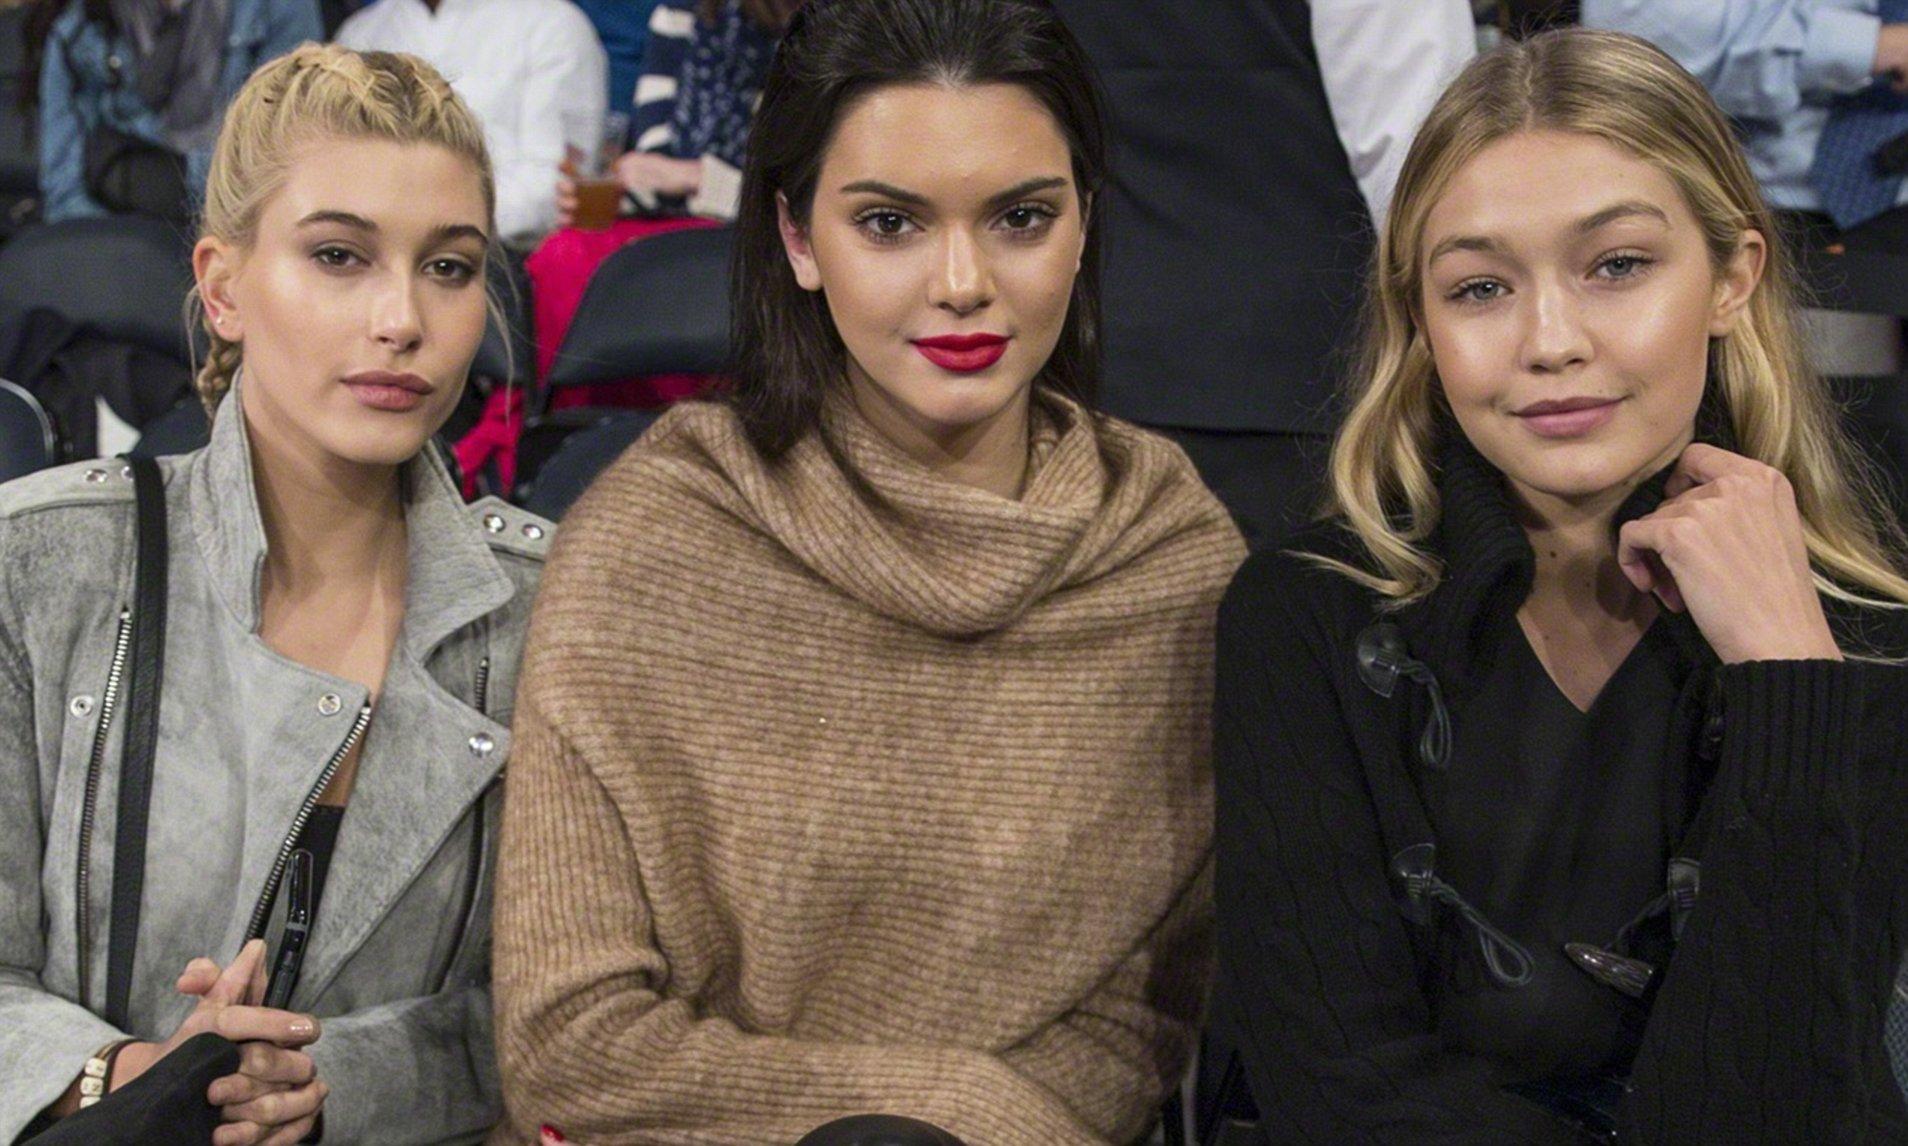 Hailey Baldwin 'used to feel inferior' to Gigi Hadid, Kendall Jenner